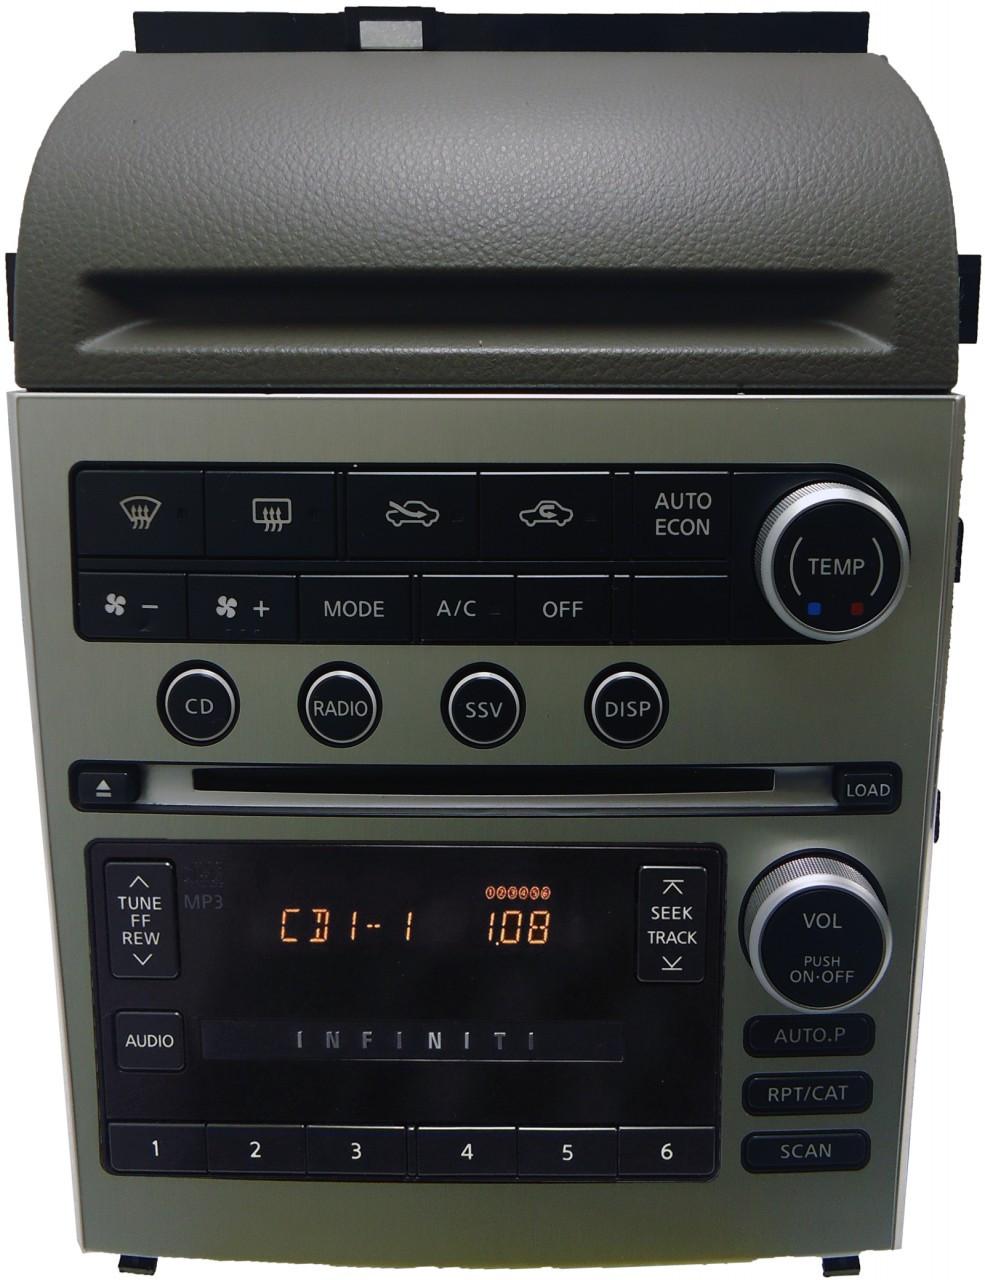 05 Infiniti G35 Radio Tape MP3 Player CD 6 Changer